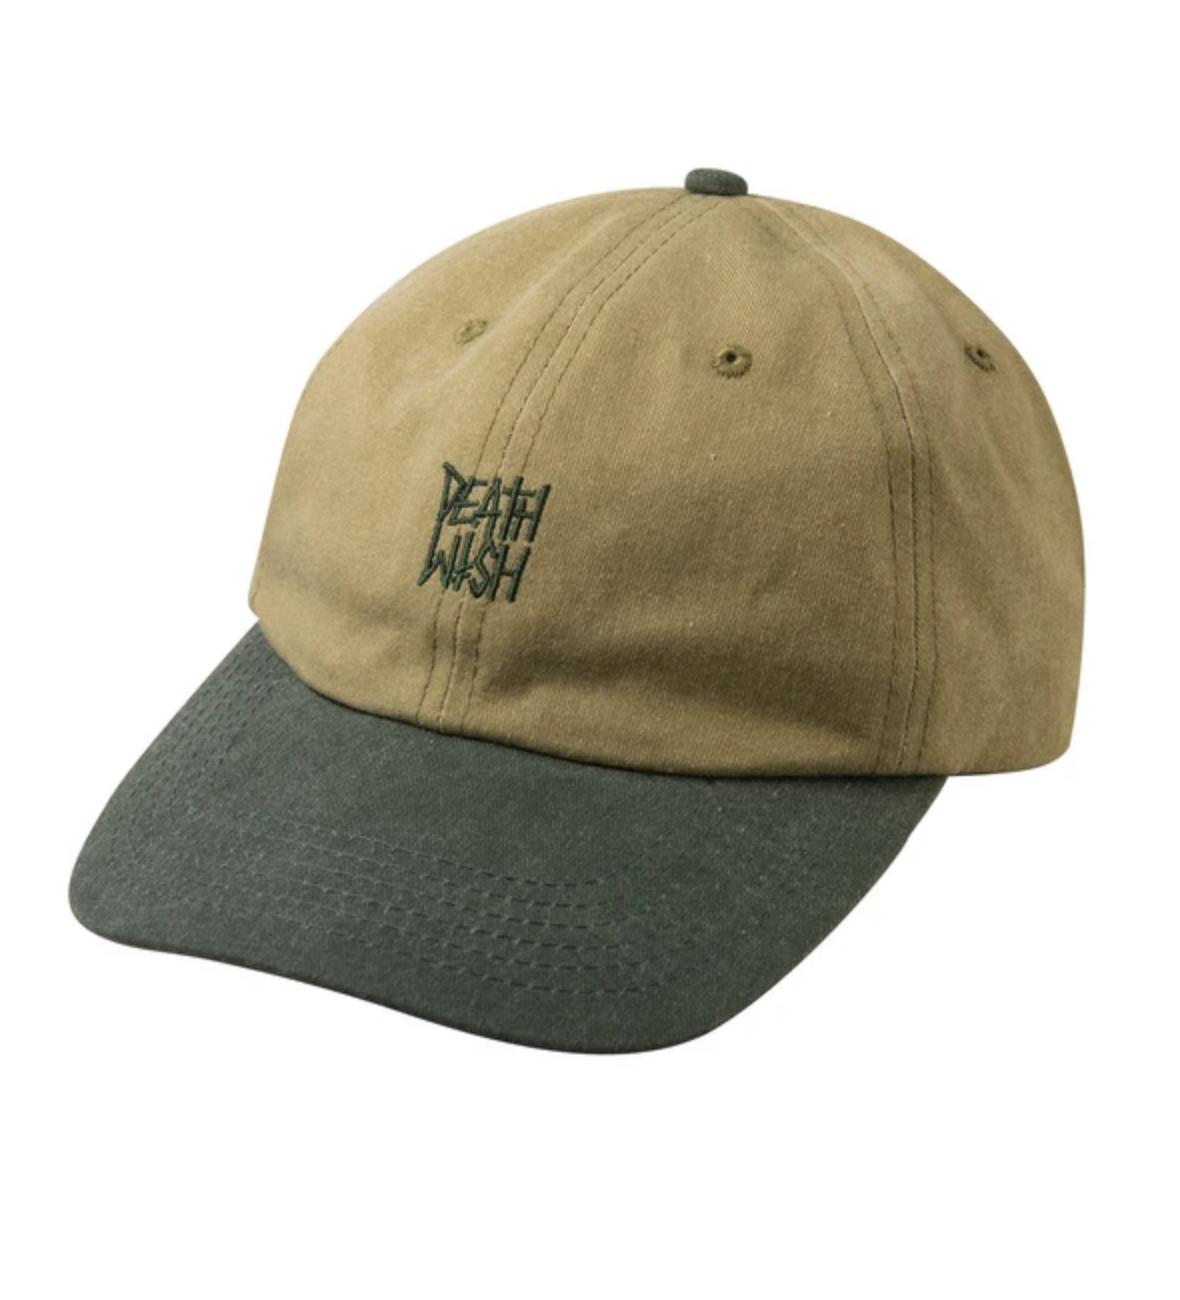 Deathwish Skateboards Deathstack Khaki/Green Dad Cap